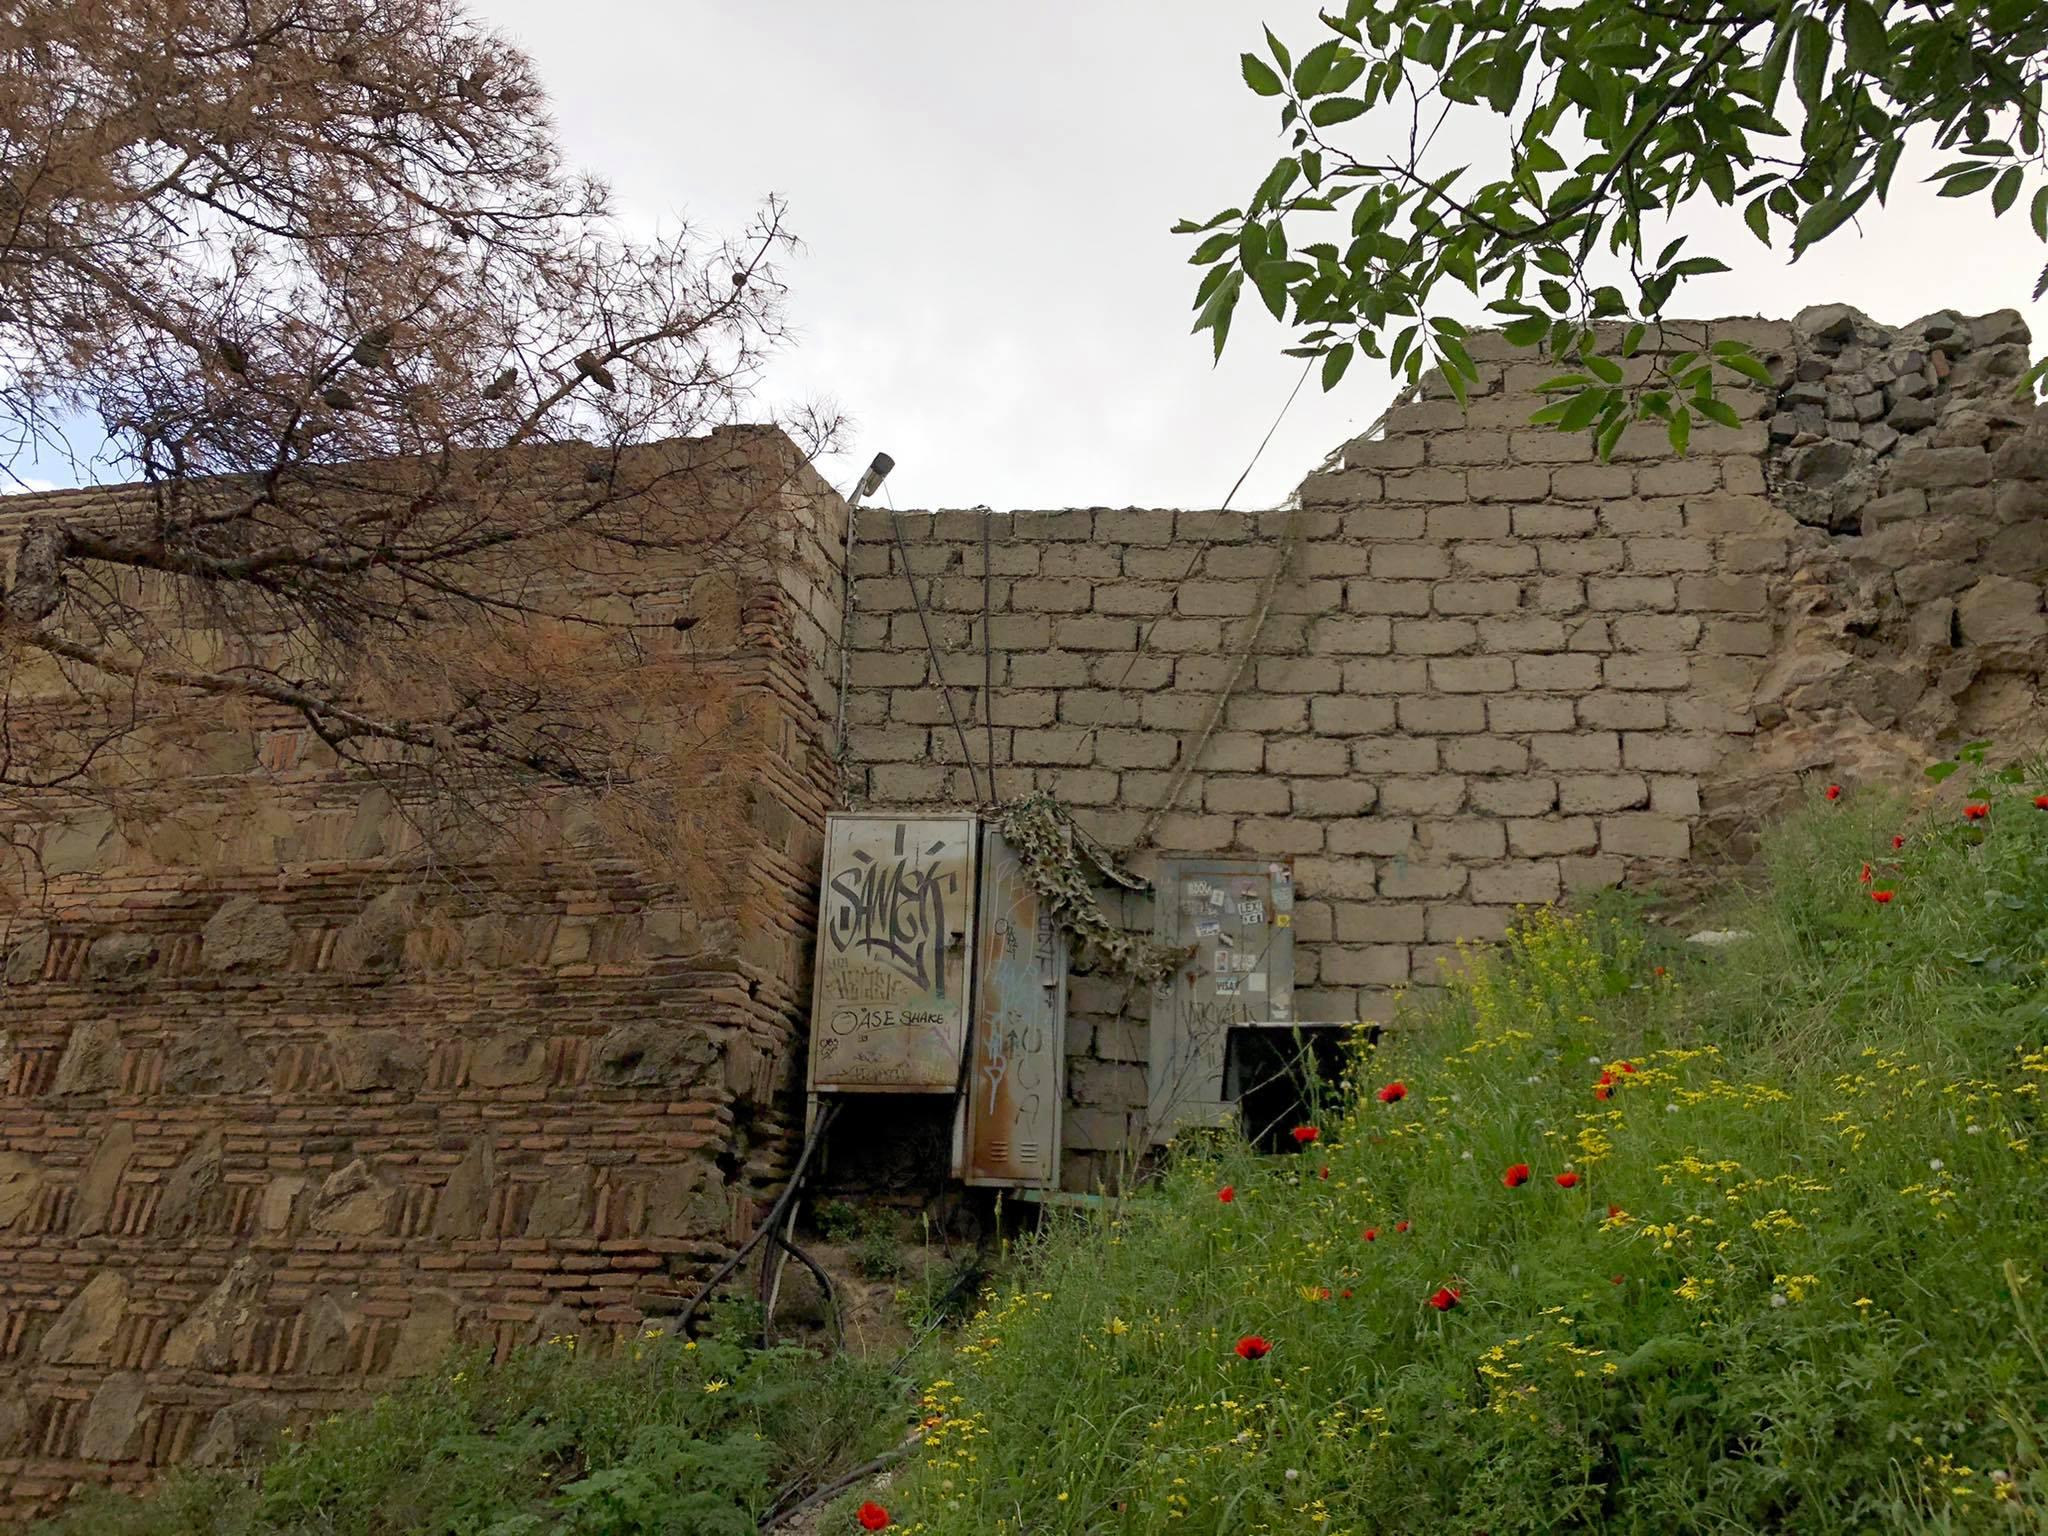 179951765 138197048319711 2543941090997080143 n #новости архитектура, культурное наследие, Нарикала, тбилиси